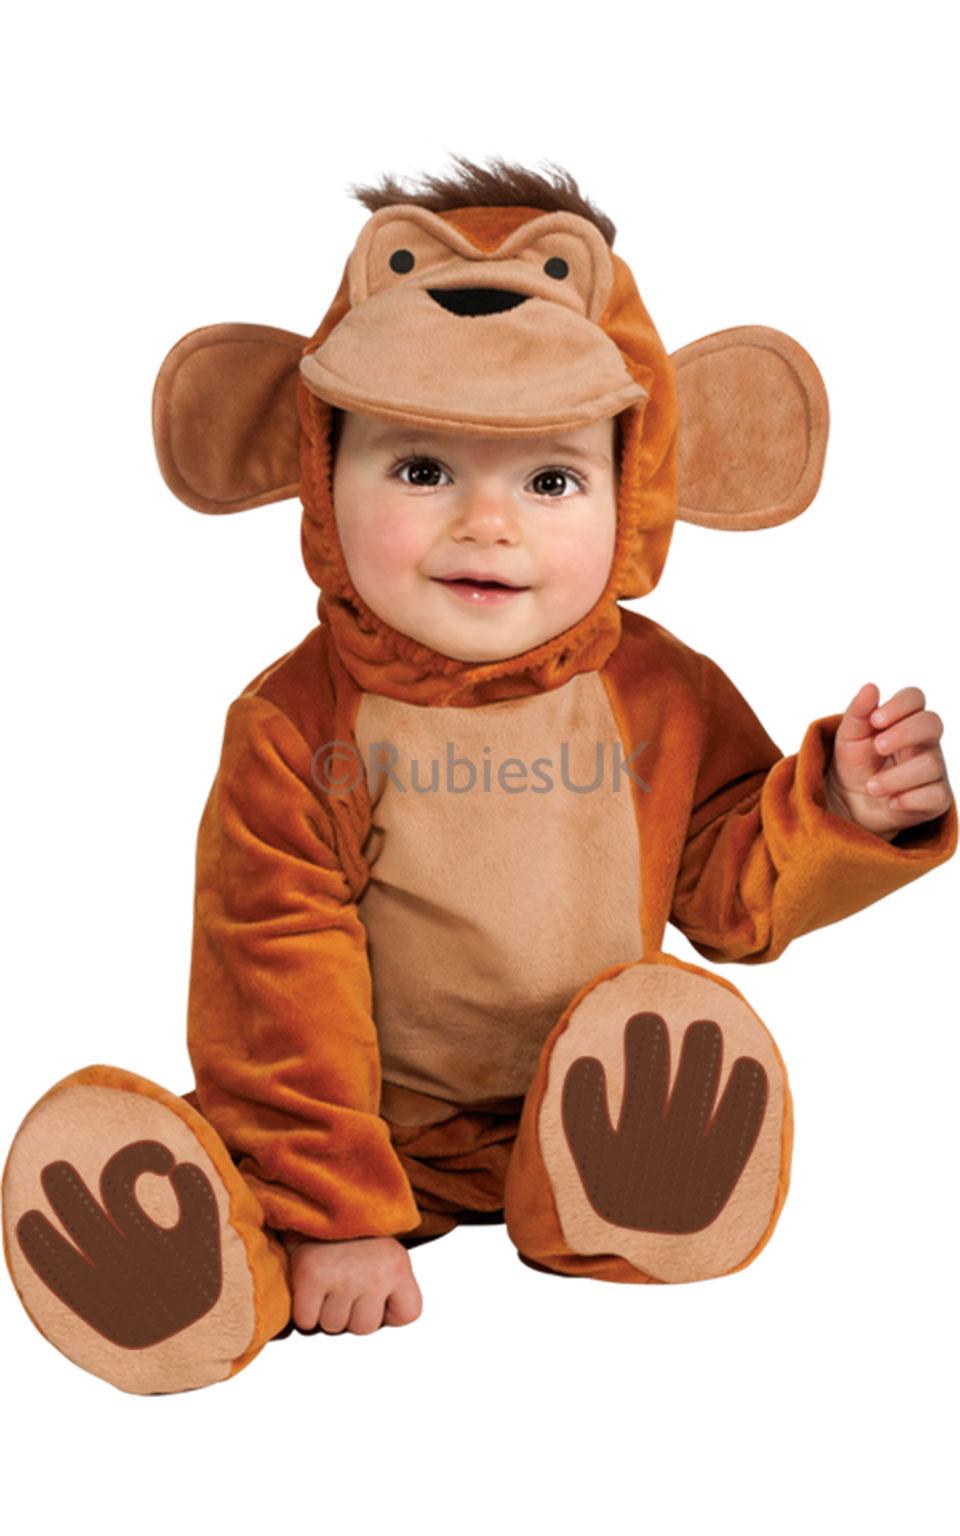 Kinder Baby Affe Kostüm Dschungel-Tier Outfit Verkleiden ...